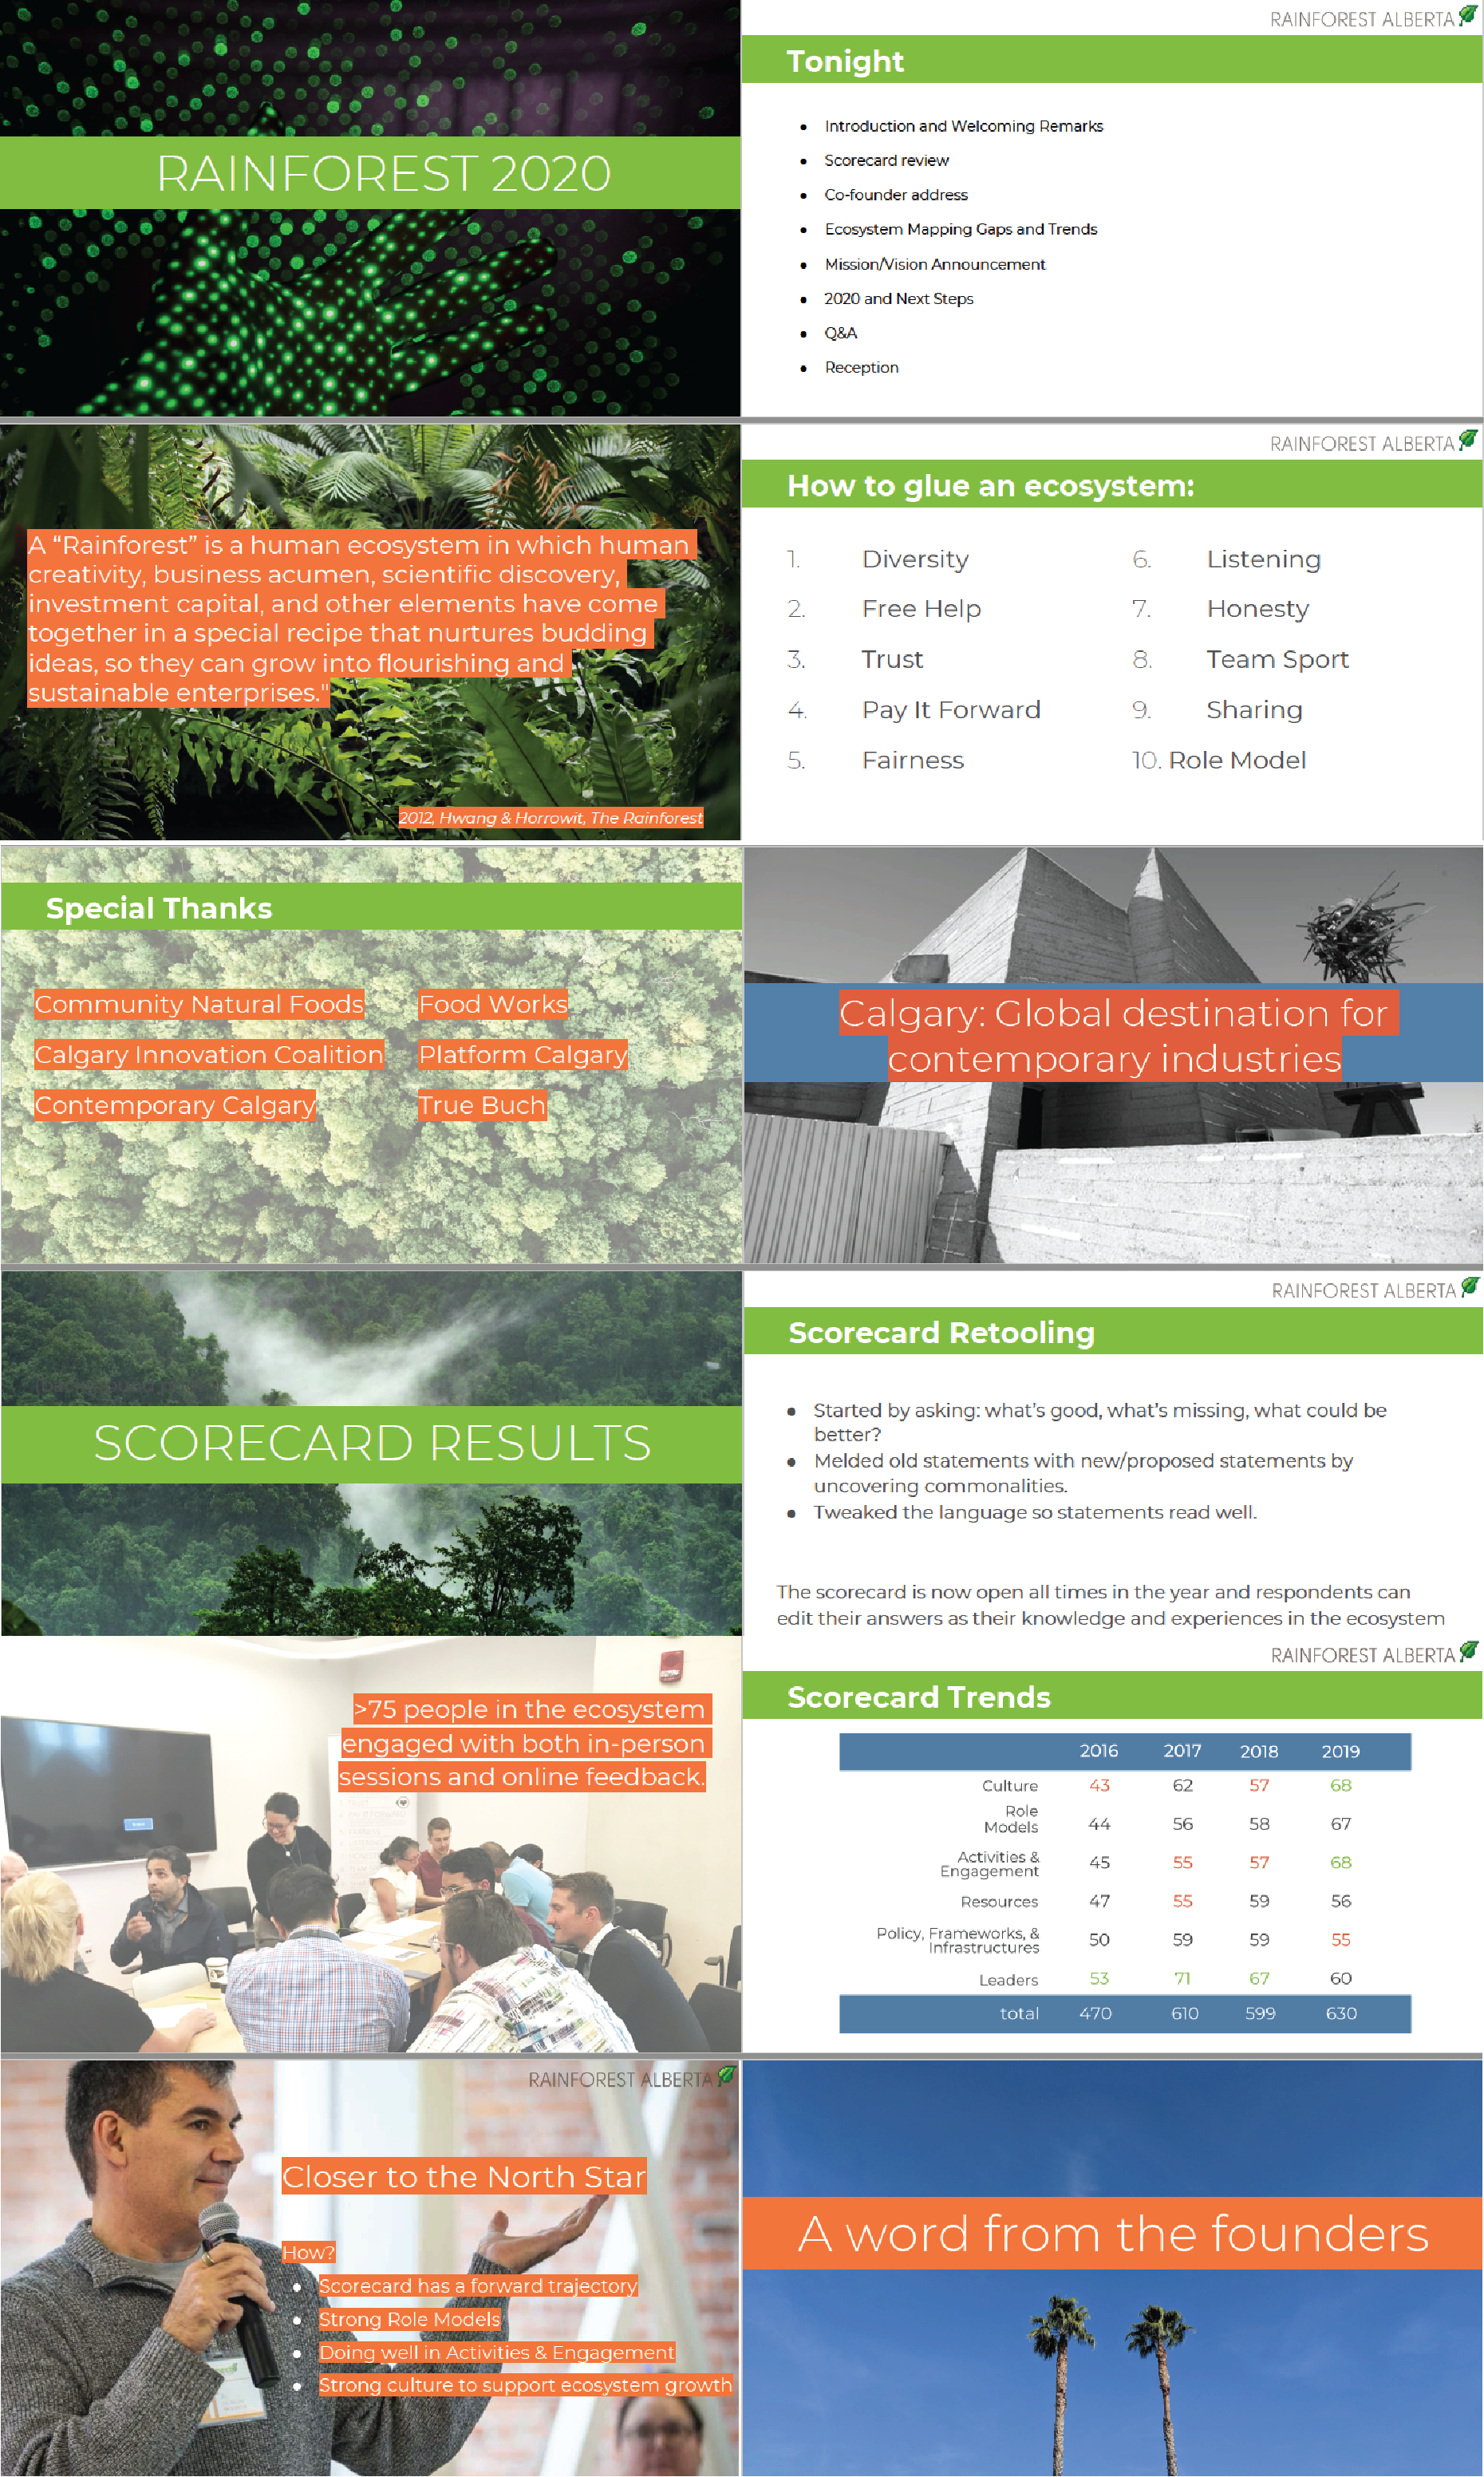 Rainforest 2020 case study pngs-01